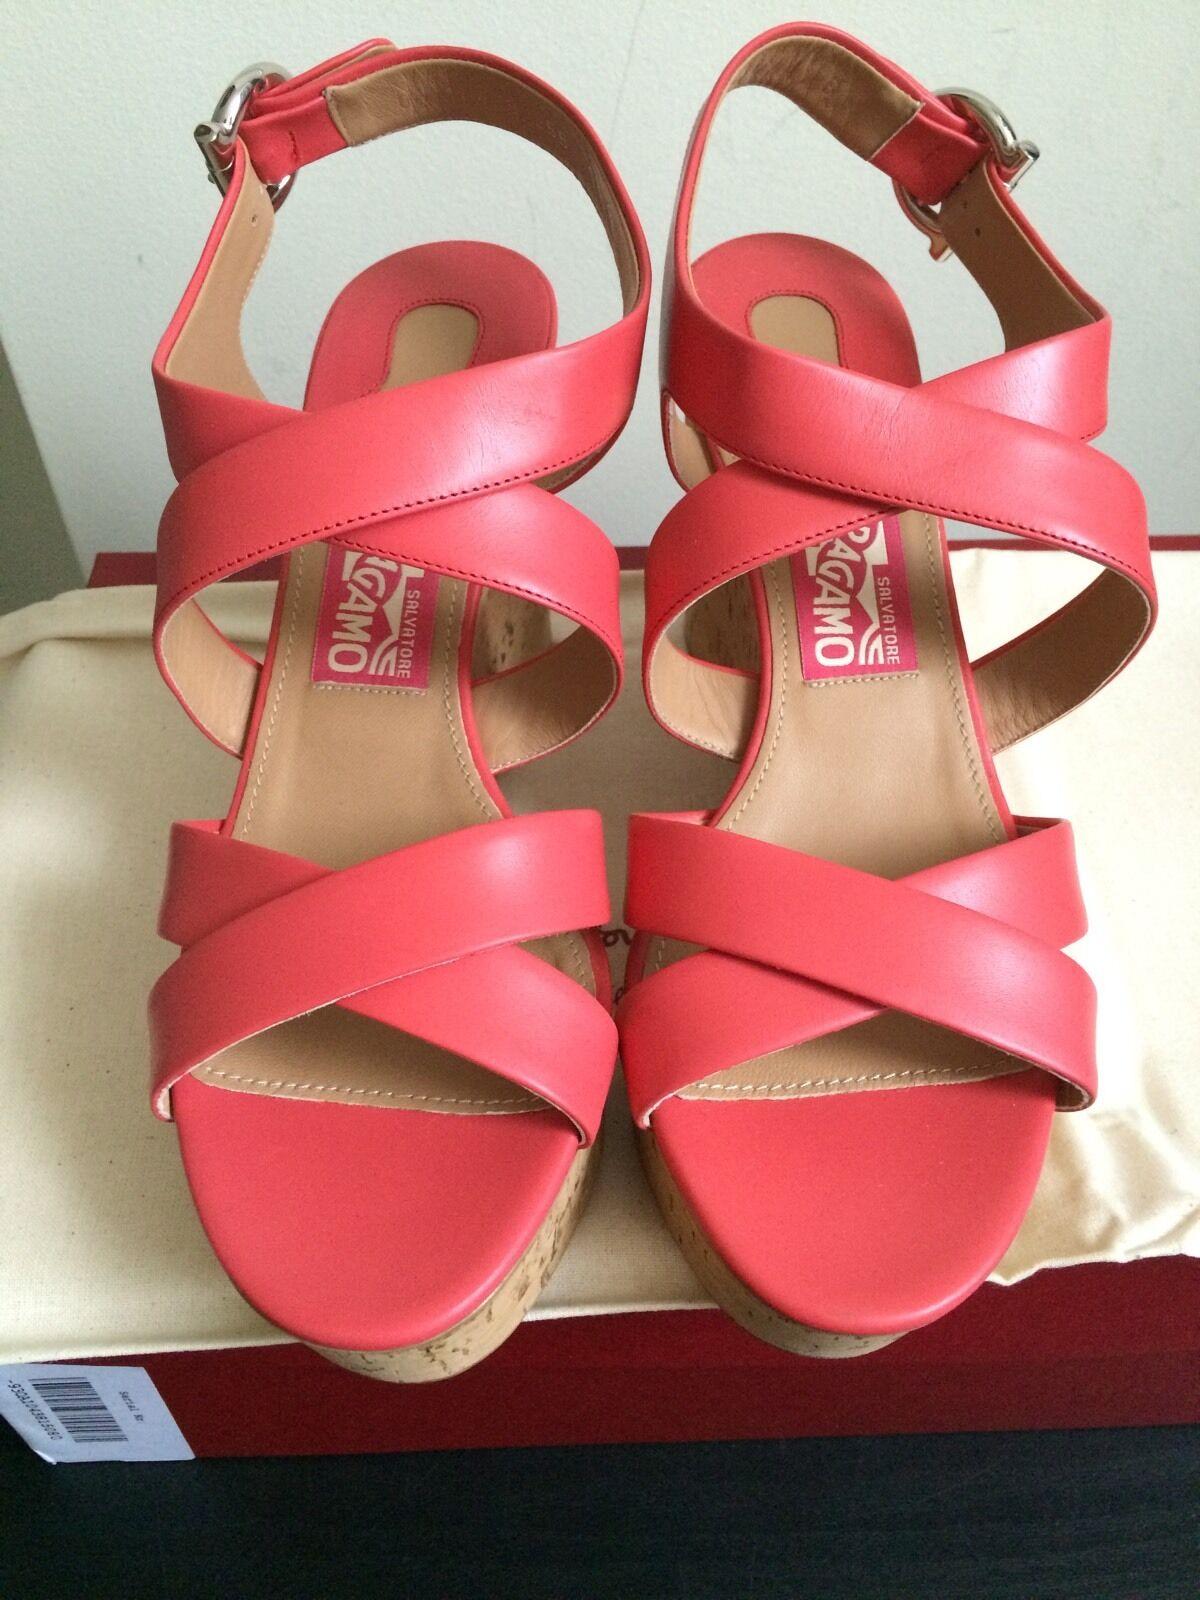 NIB  595 Salvatore Ferragamo Persy Leather Cork Wedge Sandals pink Size 8